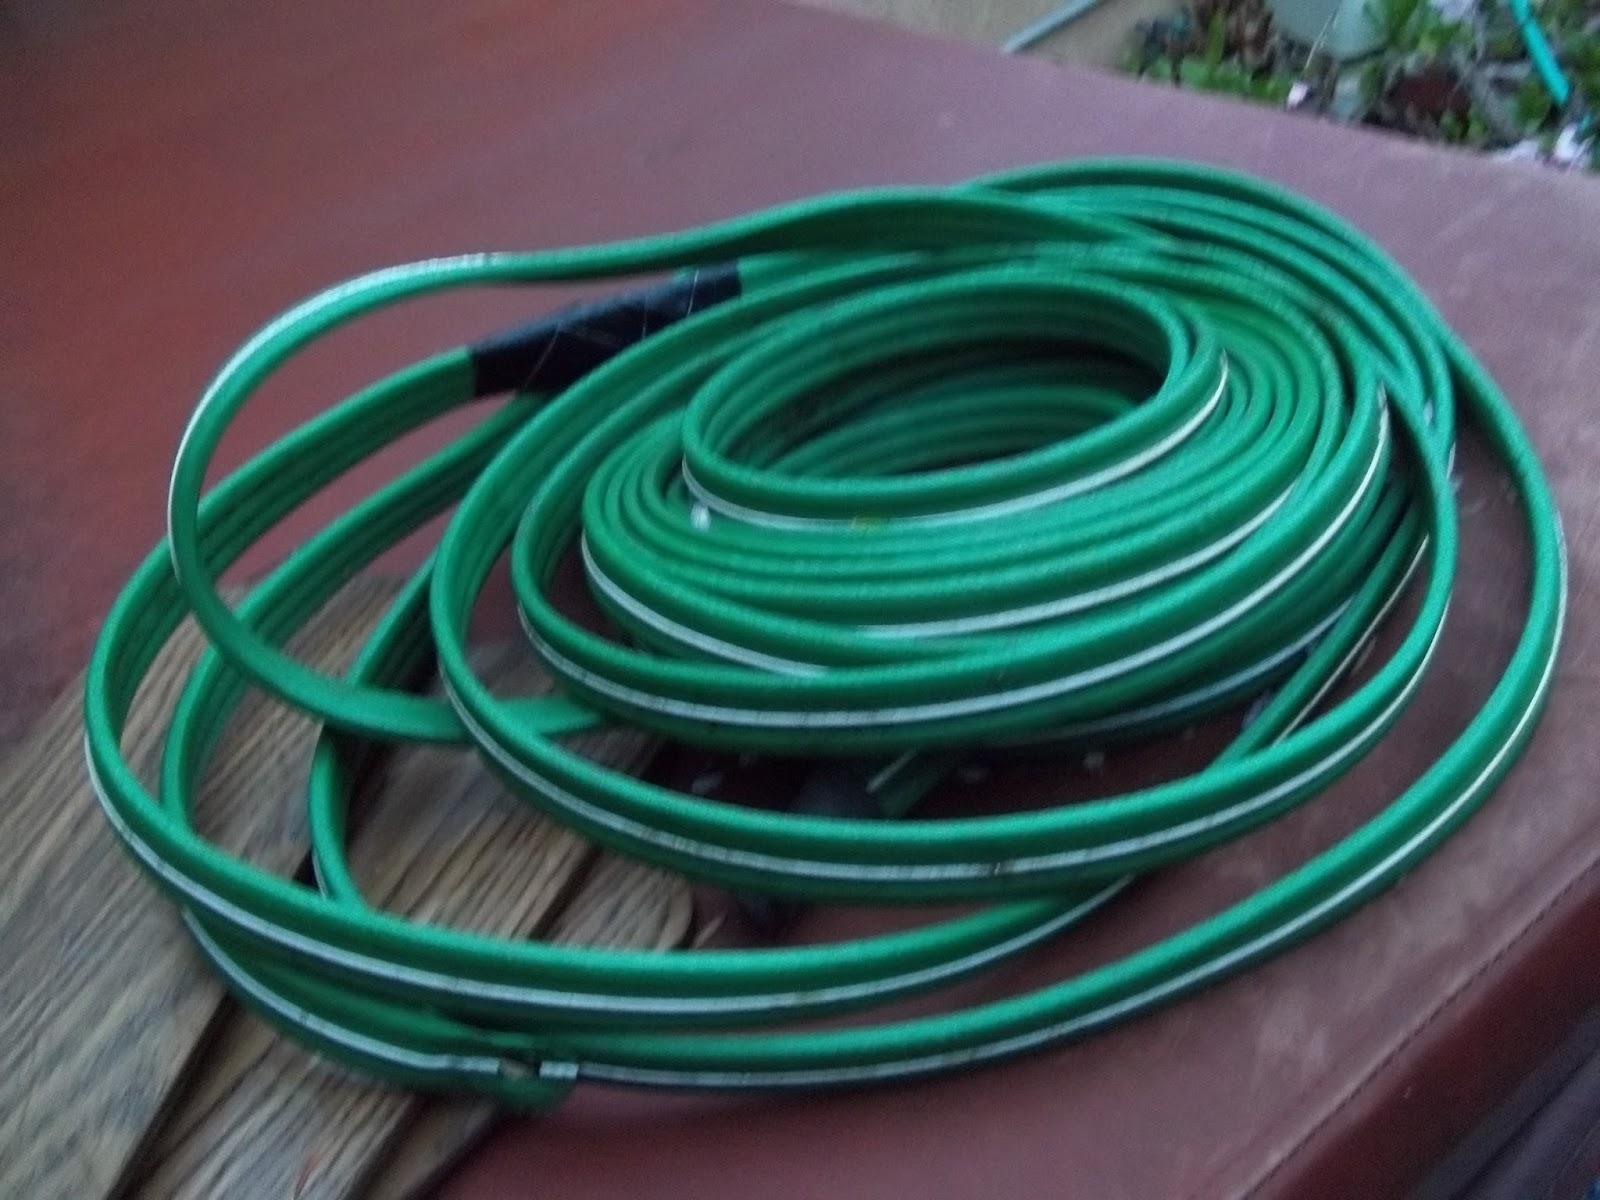 Dragonfly Treasure: Garden Hose Recycle